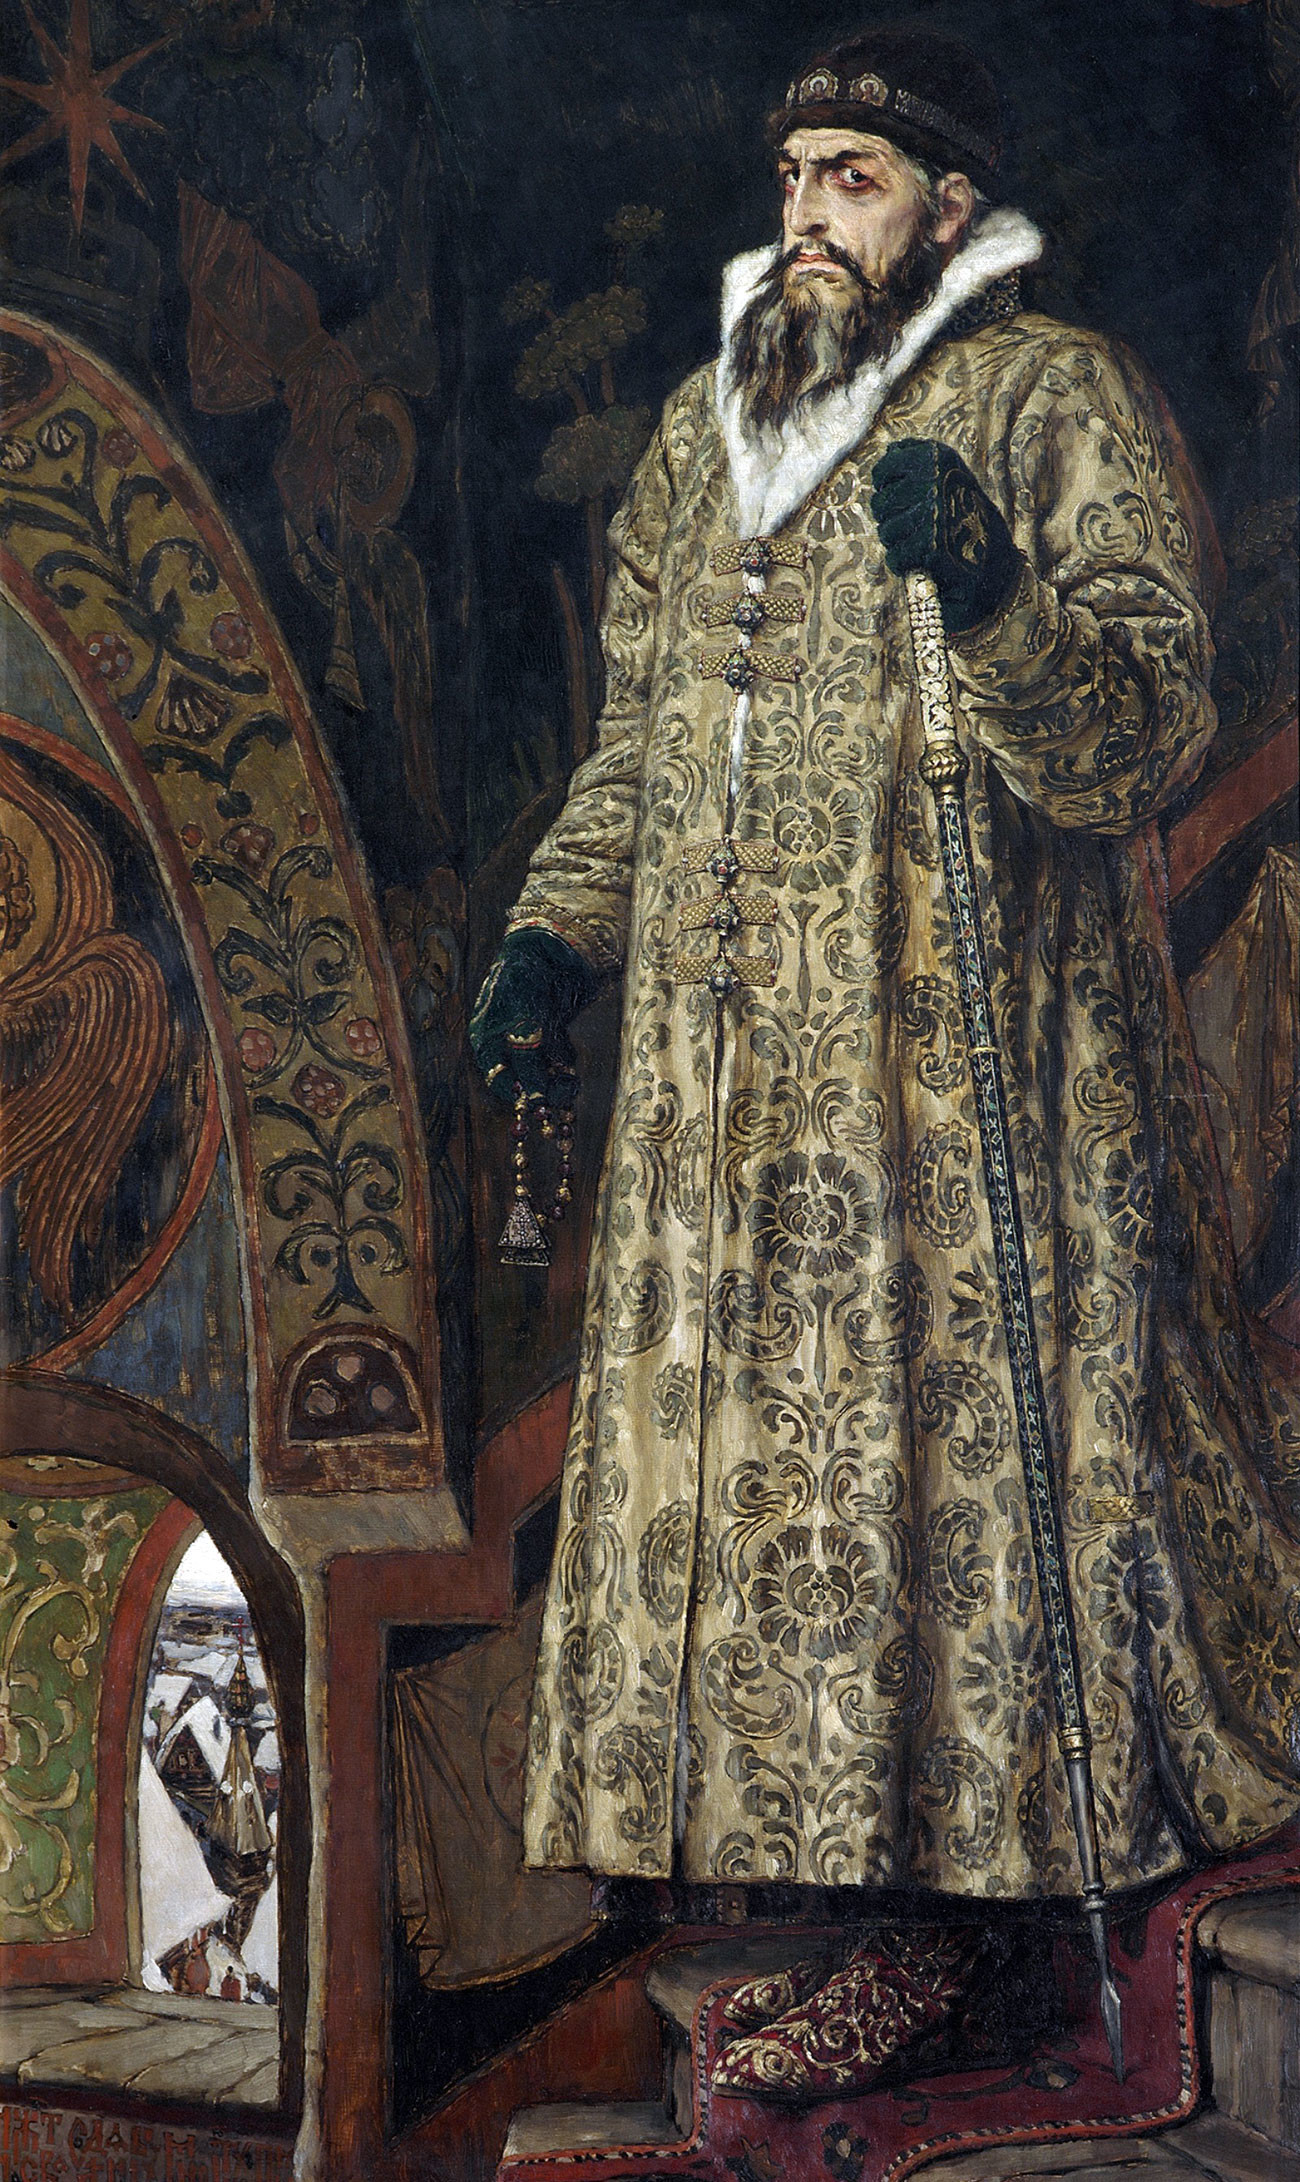 Portret Ivana Groznog, slikar Viktor Mihajlovič Vasnjecov, 1897.